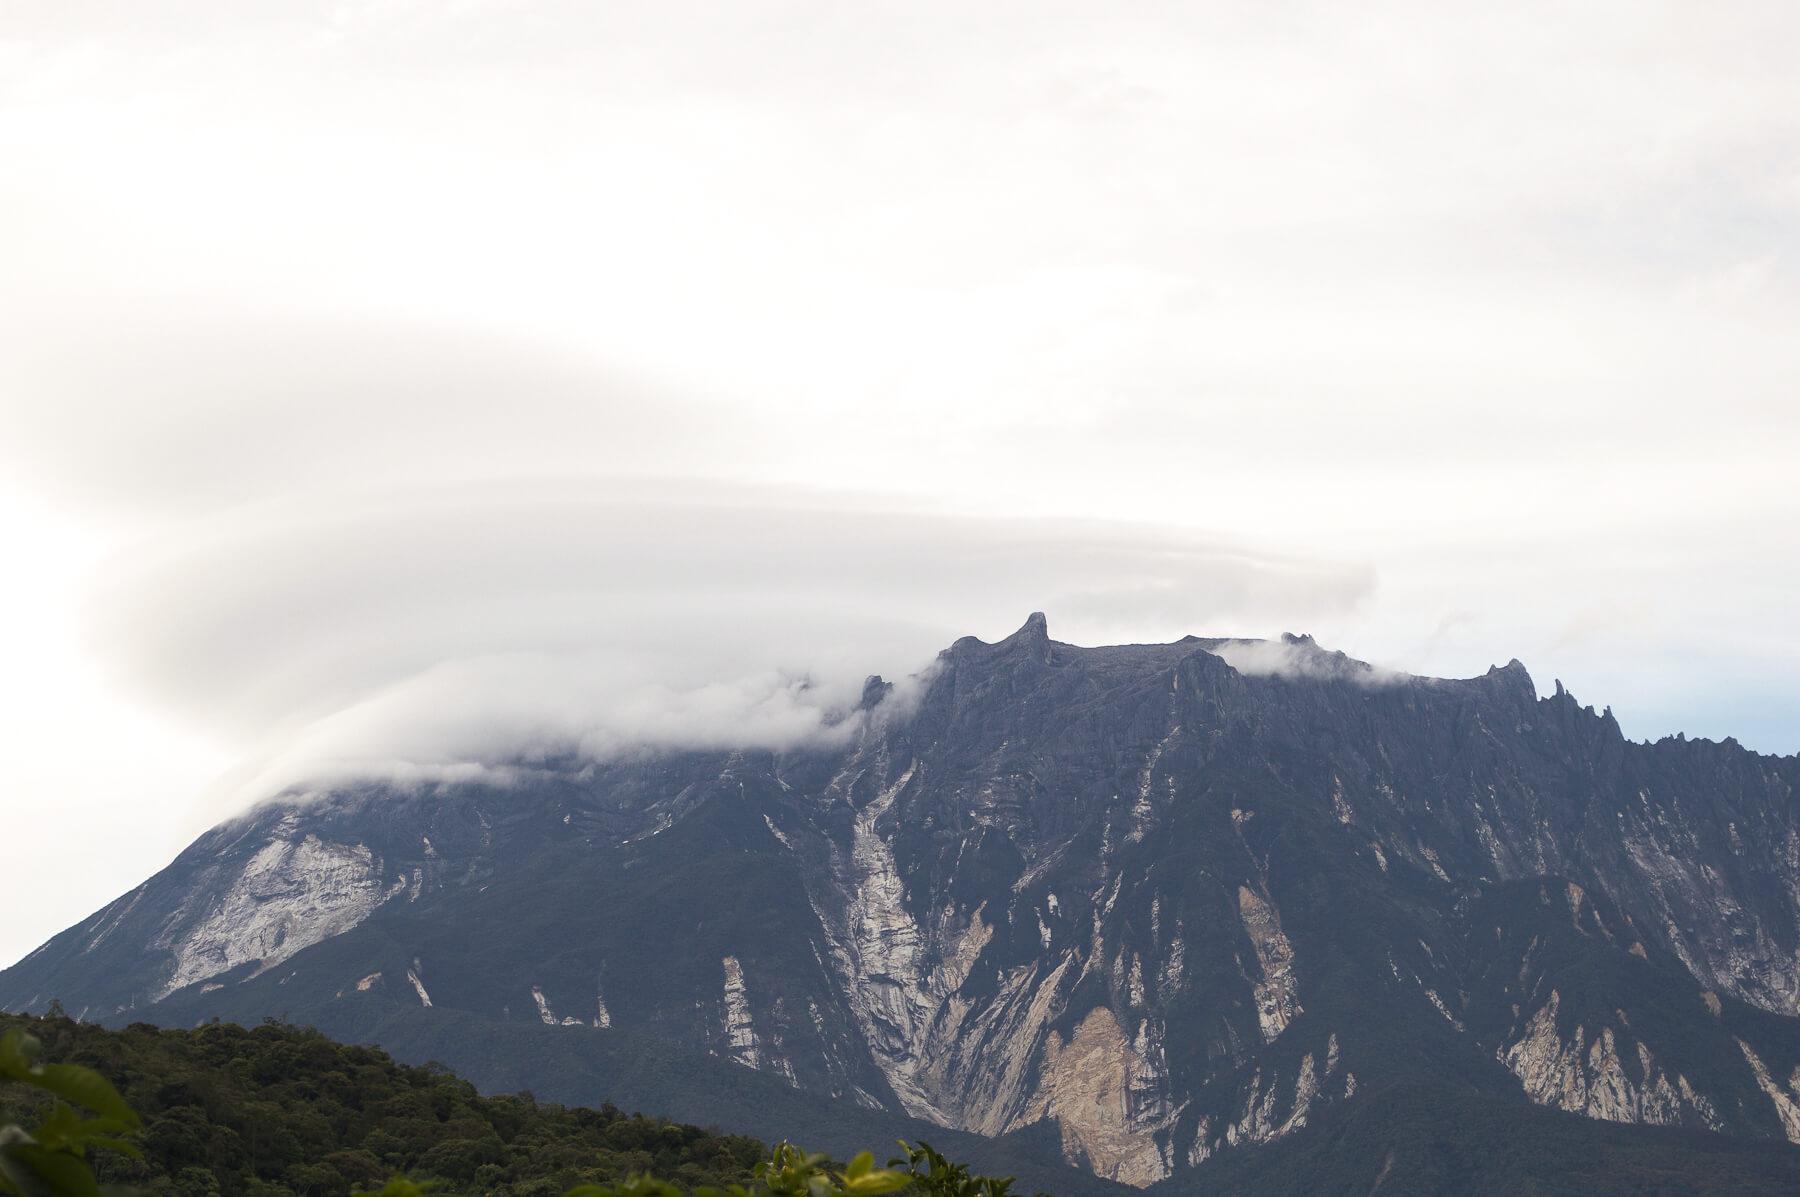 Clouds resting on peak of Mount Kinabalu